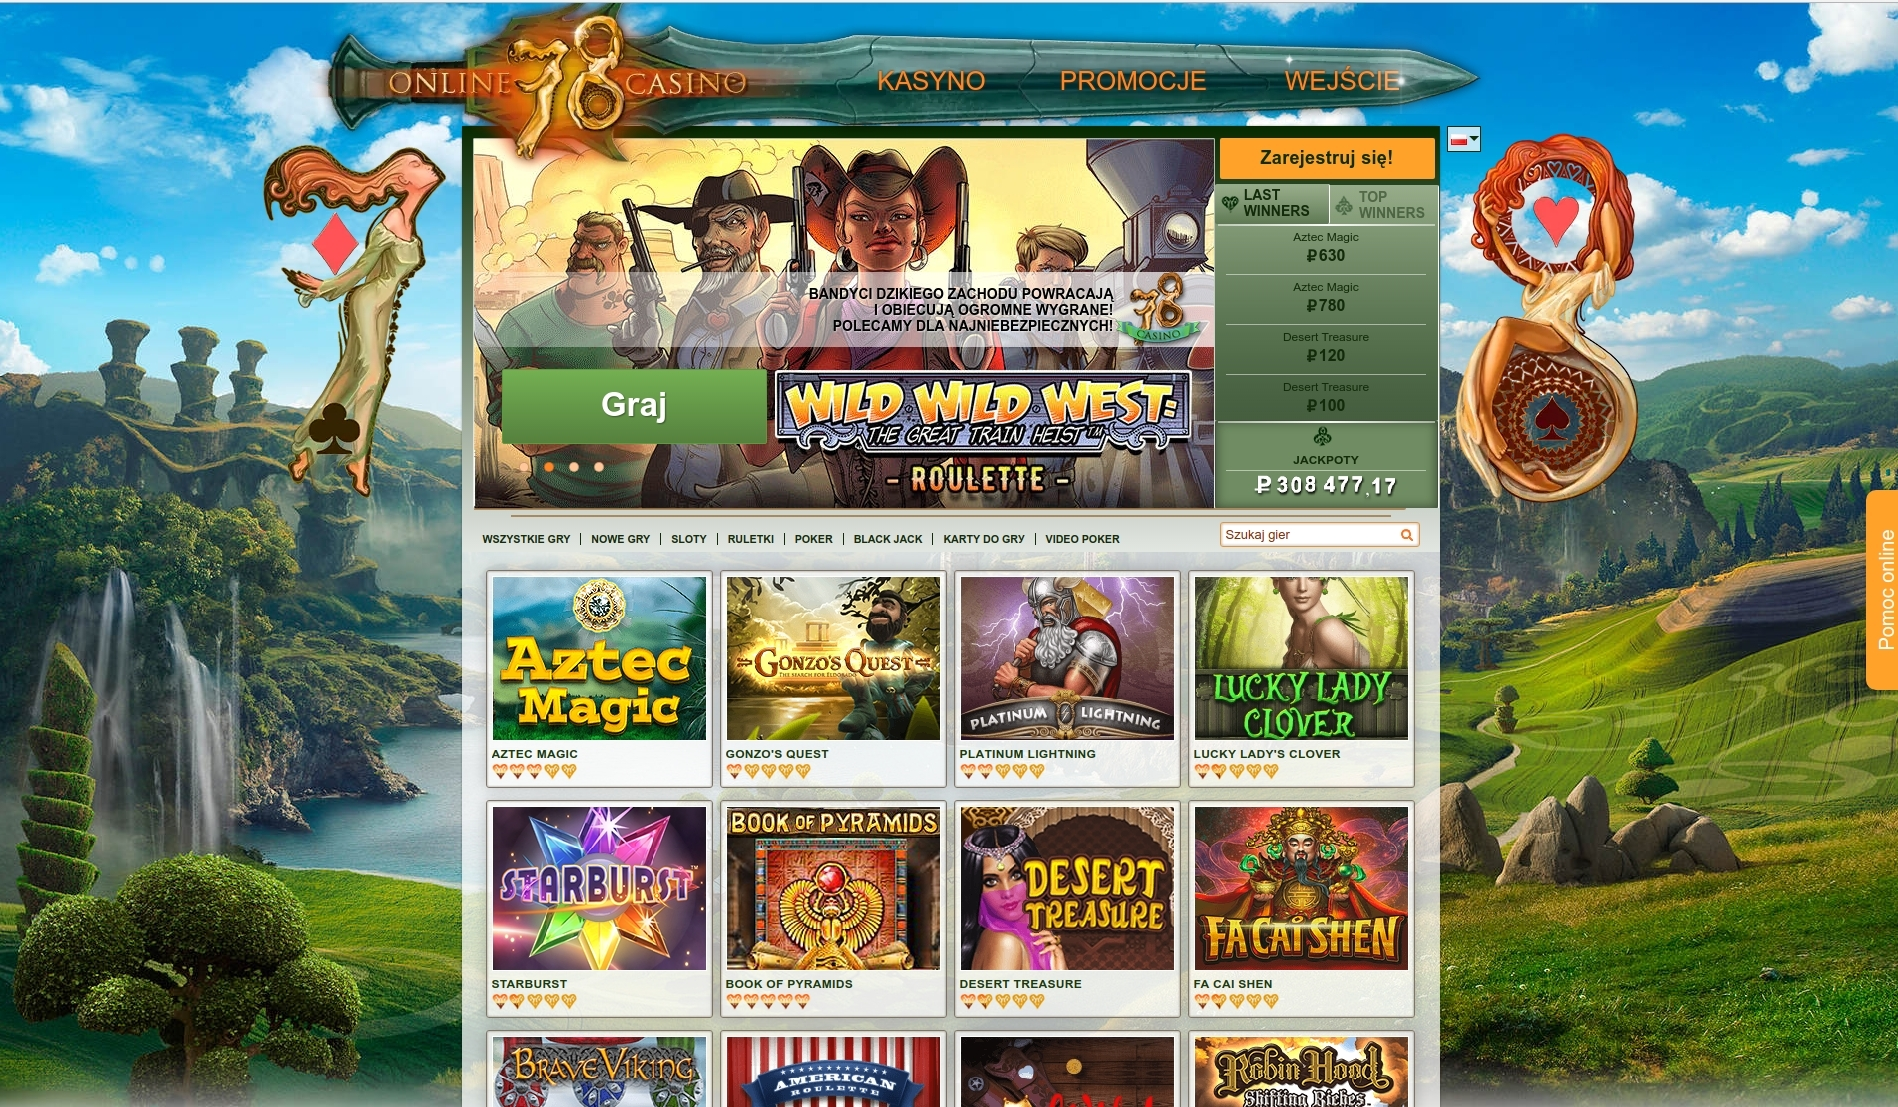 Онлайн казино 78 честное казино онлайн форум